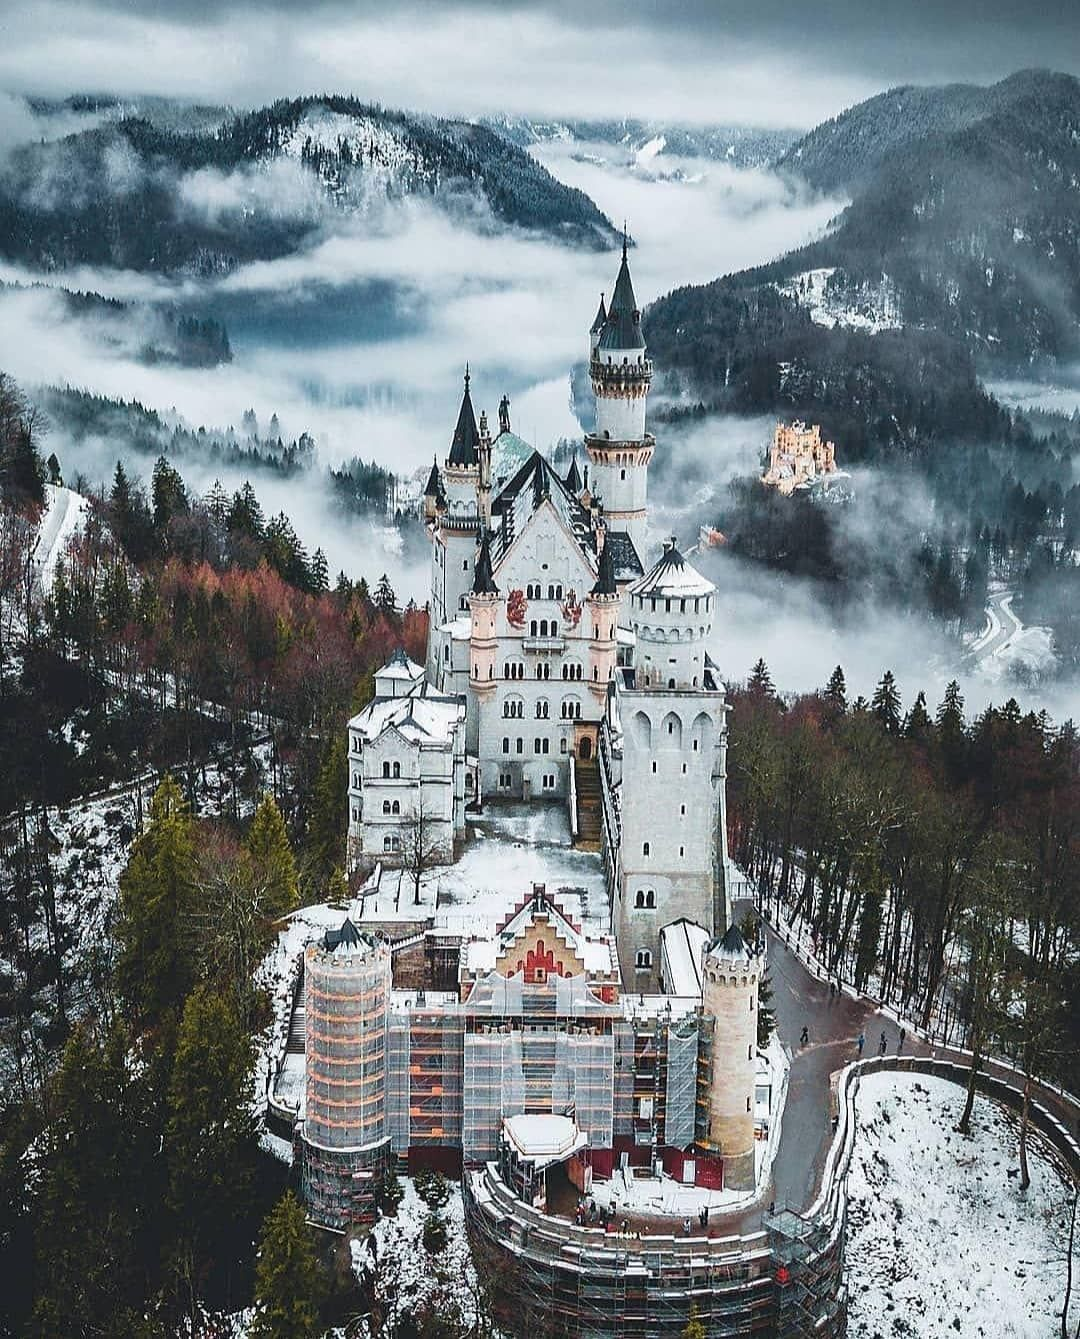 The most amazing castle in Germany. Neuschwanstein